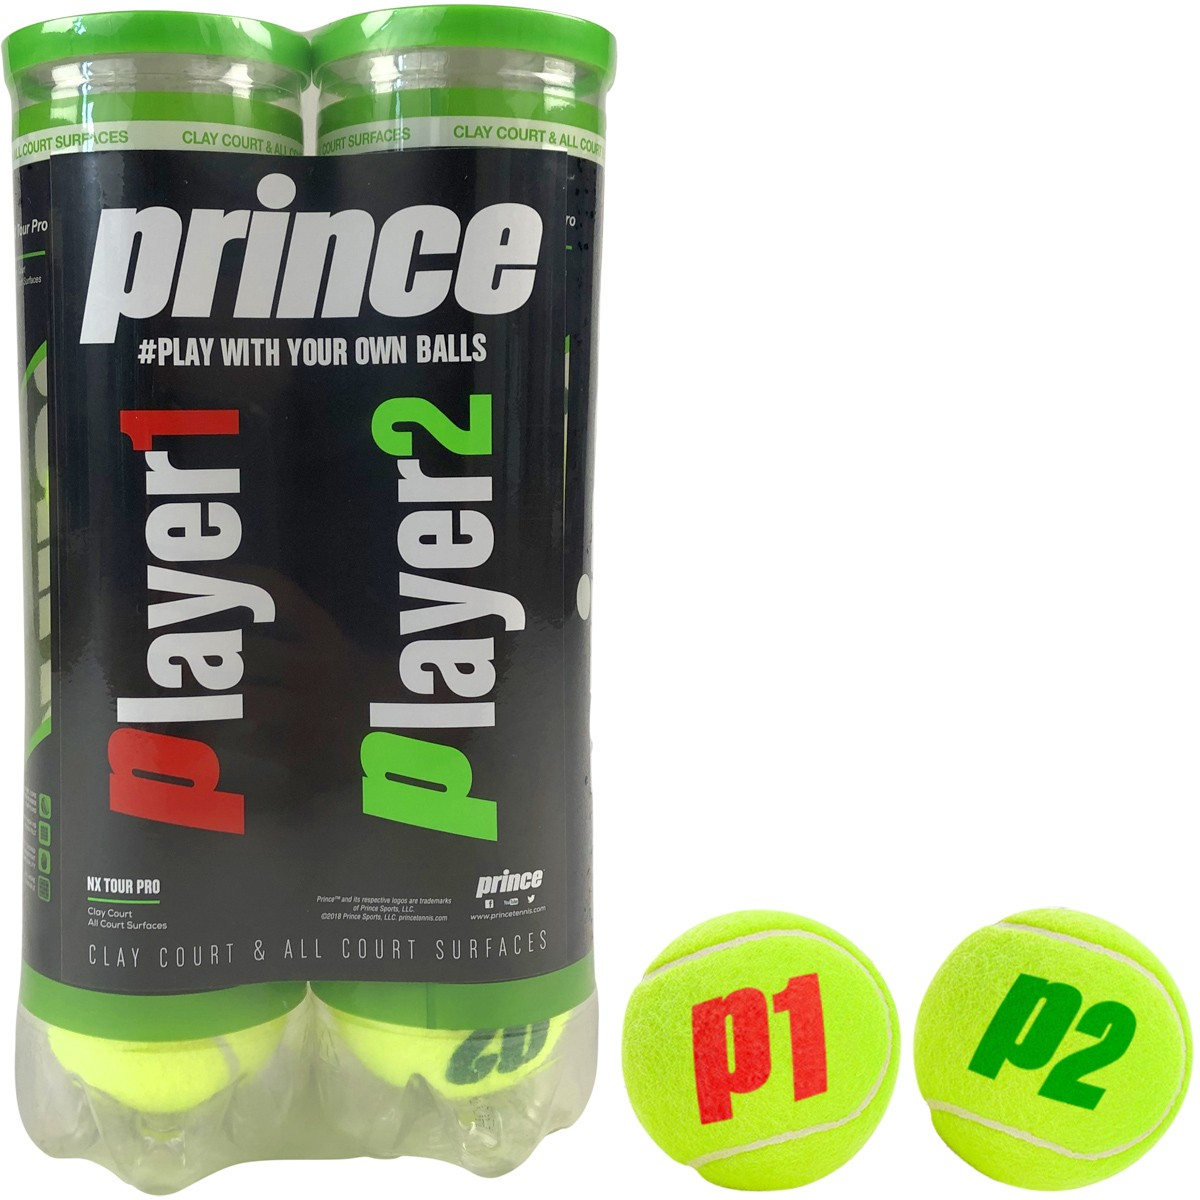 BIPACK OF 4 BALLS PRINCE NX TOUR PRO (PLAYER 1 & PLAYER 2)